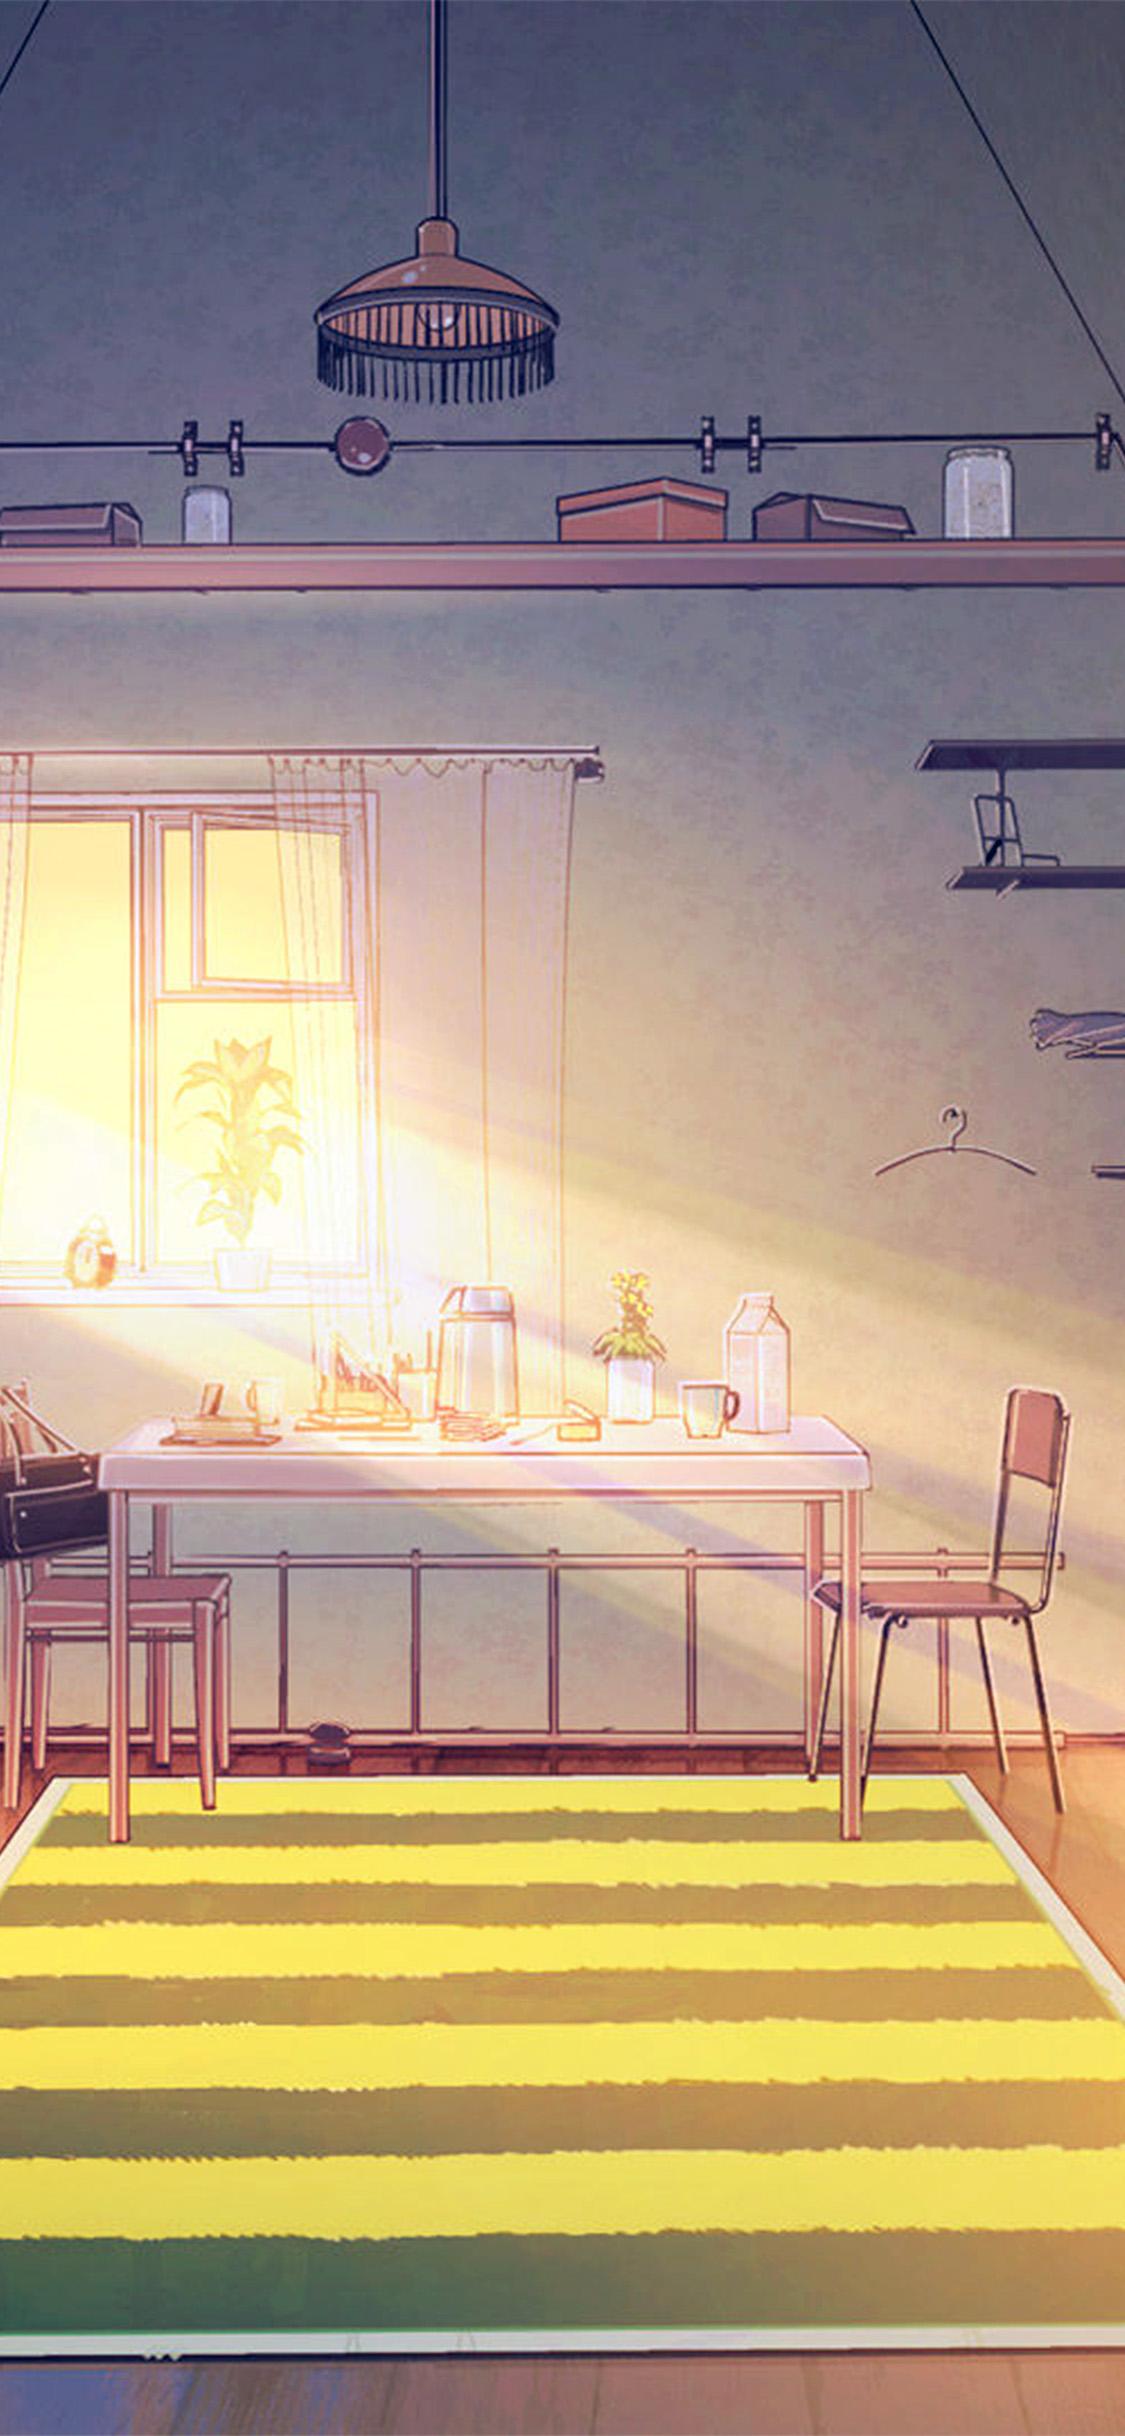 iPhonexpapers.com-Apple-iPhone-wallpaper-bd26-home-anime-arseniy-art-illustration-sunny